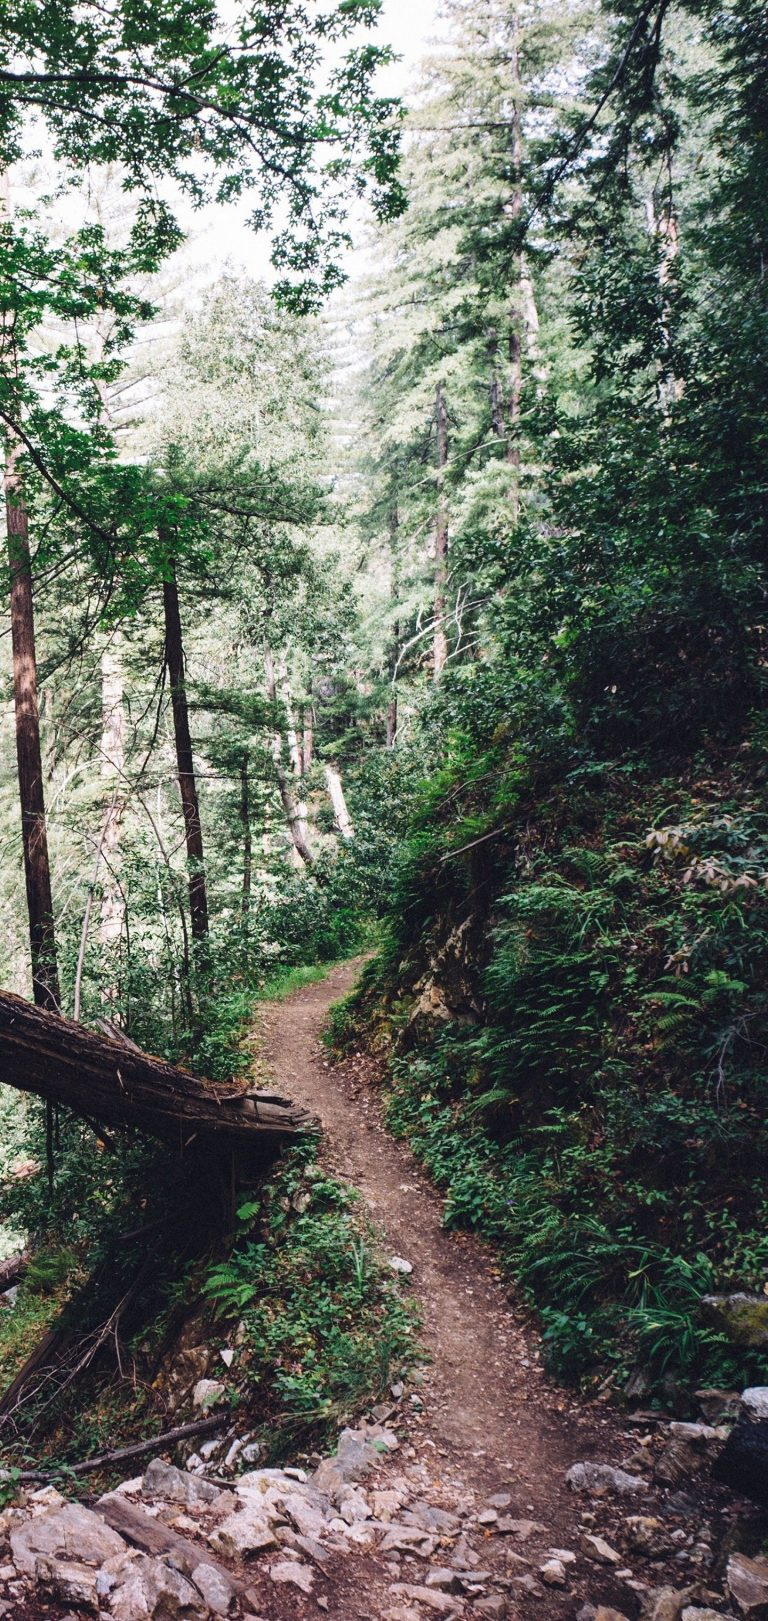 Forest Trail Trees Wallpaper 1440x3040 768x1621